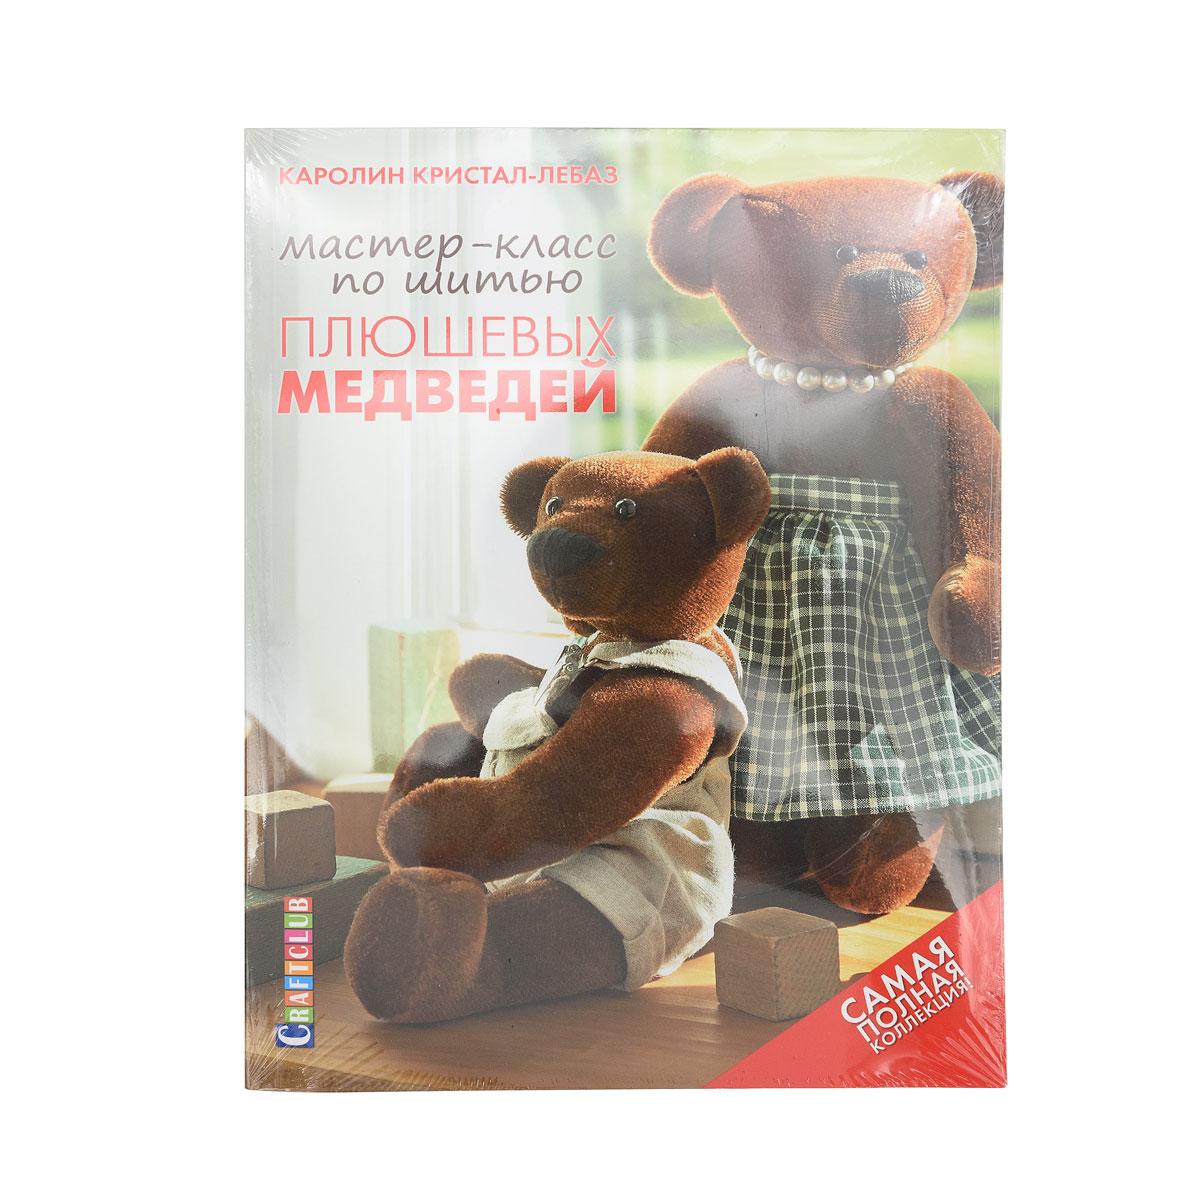 Книга. Мастер класс по шитью плюшевых медведей. Каролин Кристал-Лебаз